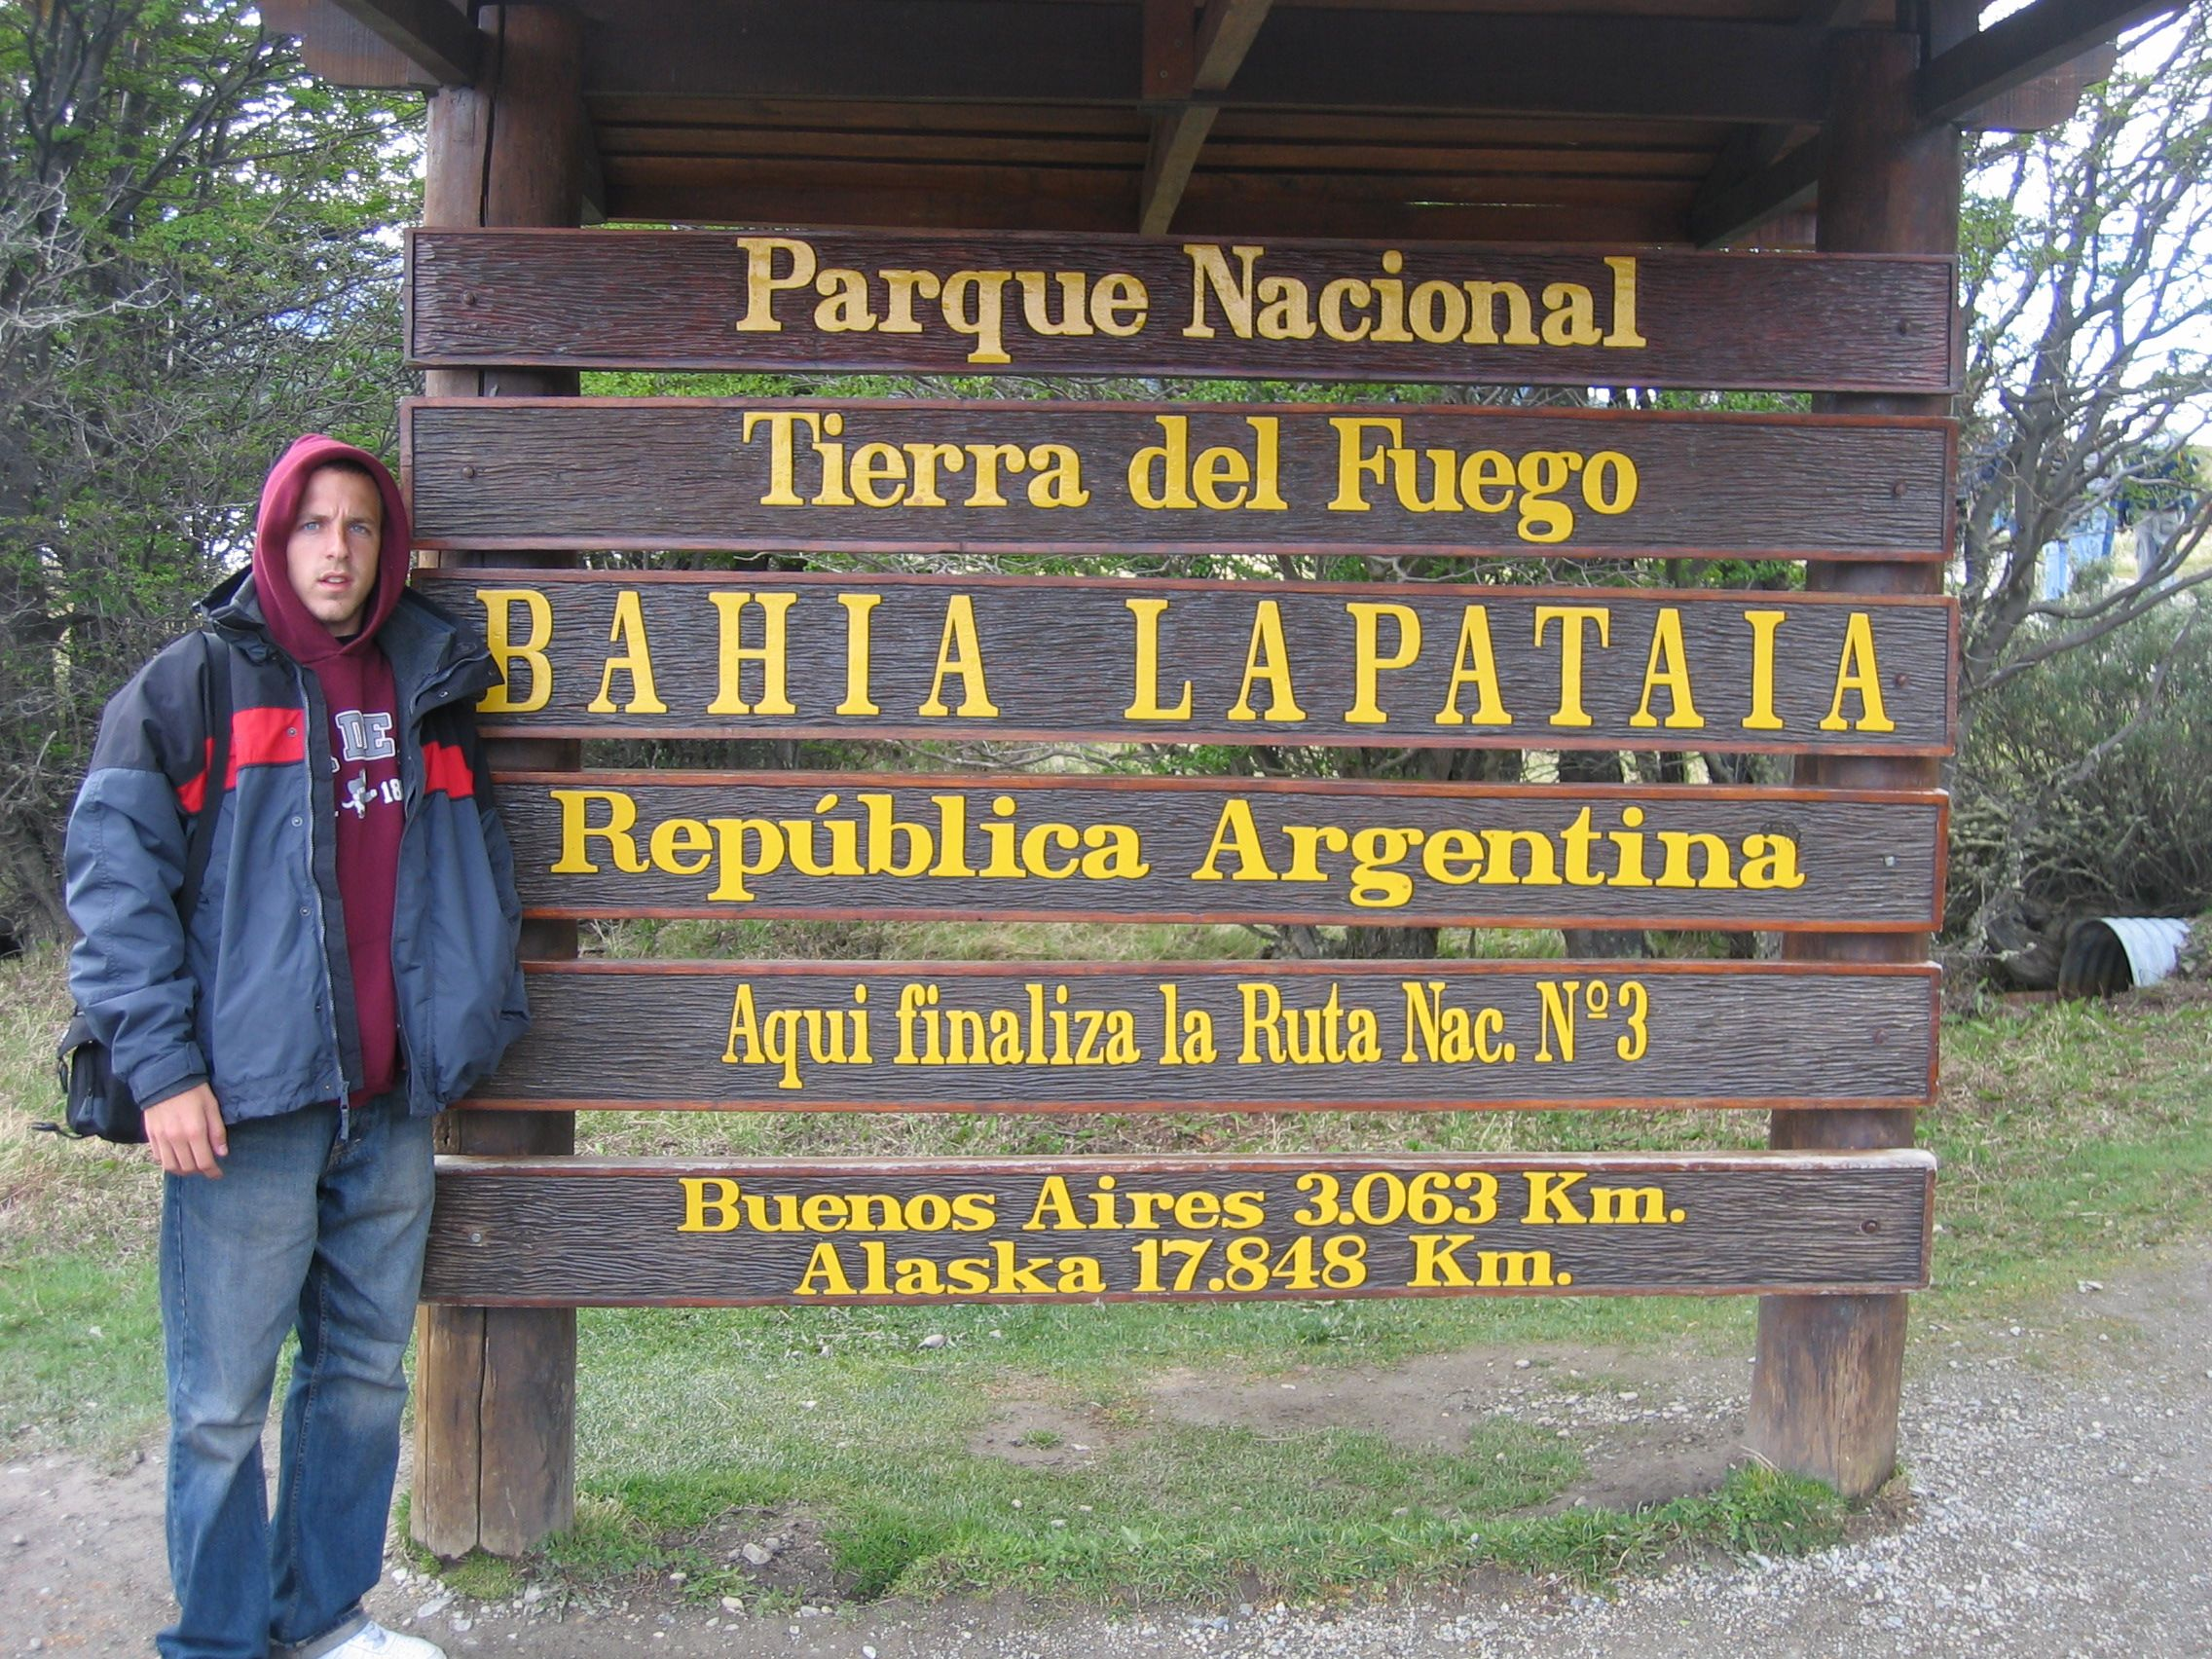 Argentina make me happy turismo places